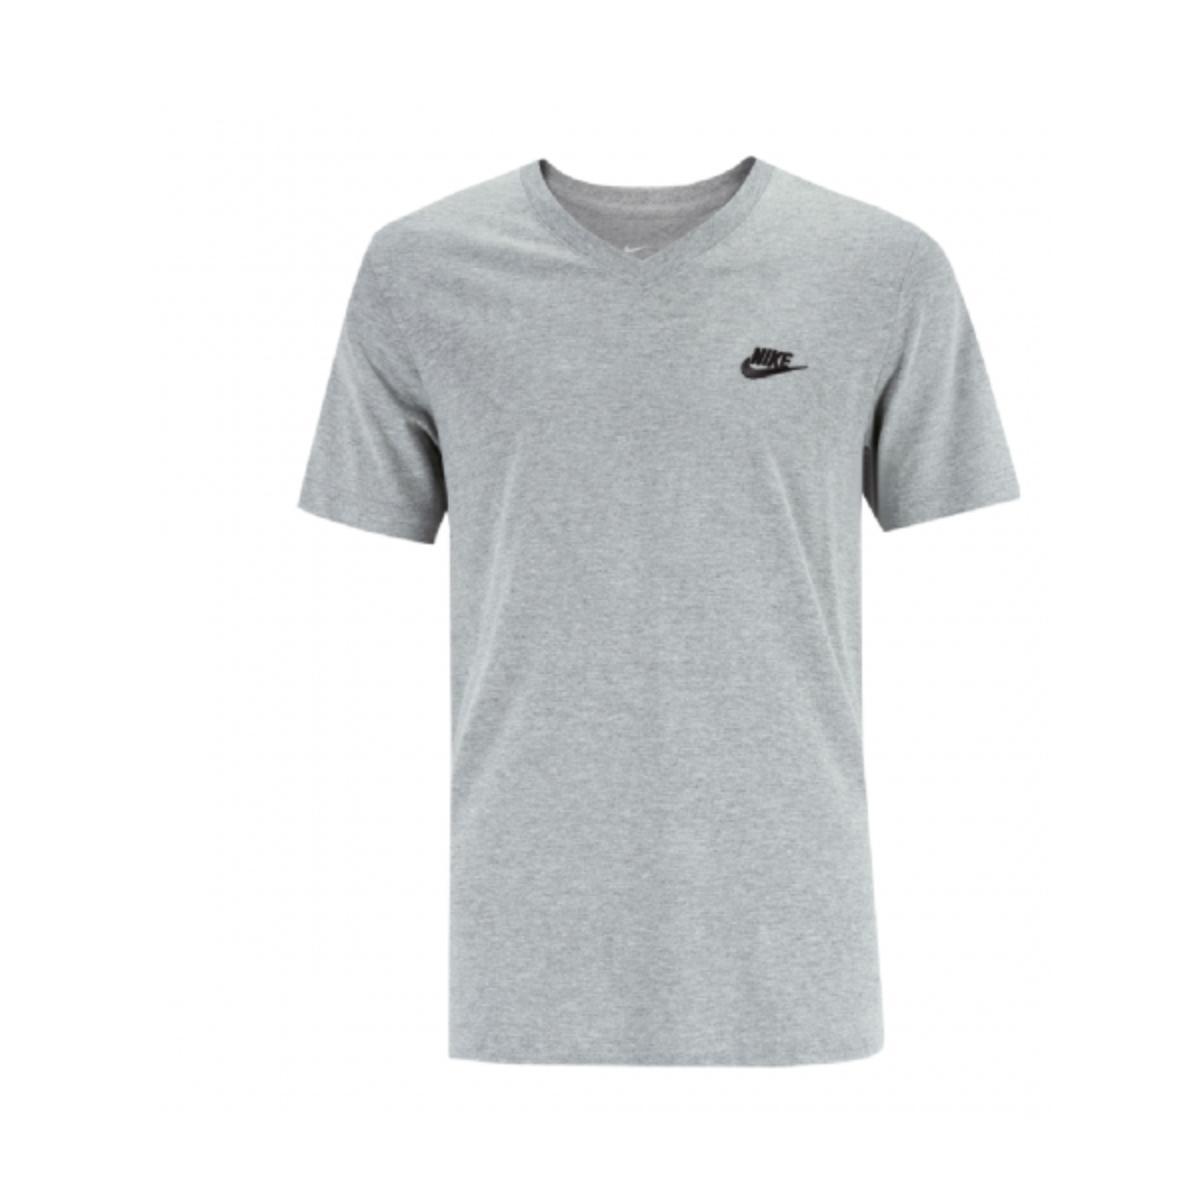 Camiseta Masculina Nike Ar5203-063 Sportswear Cinza